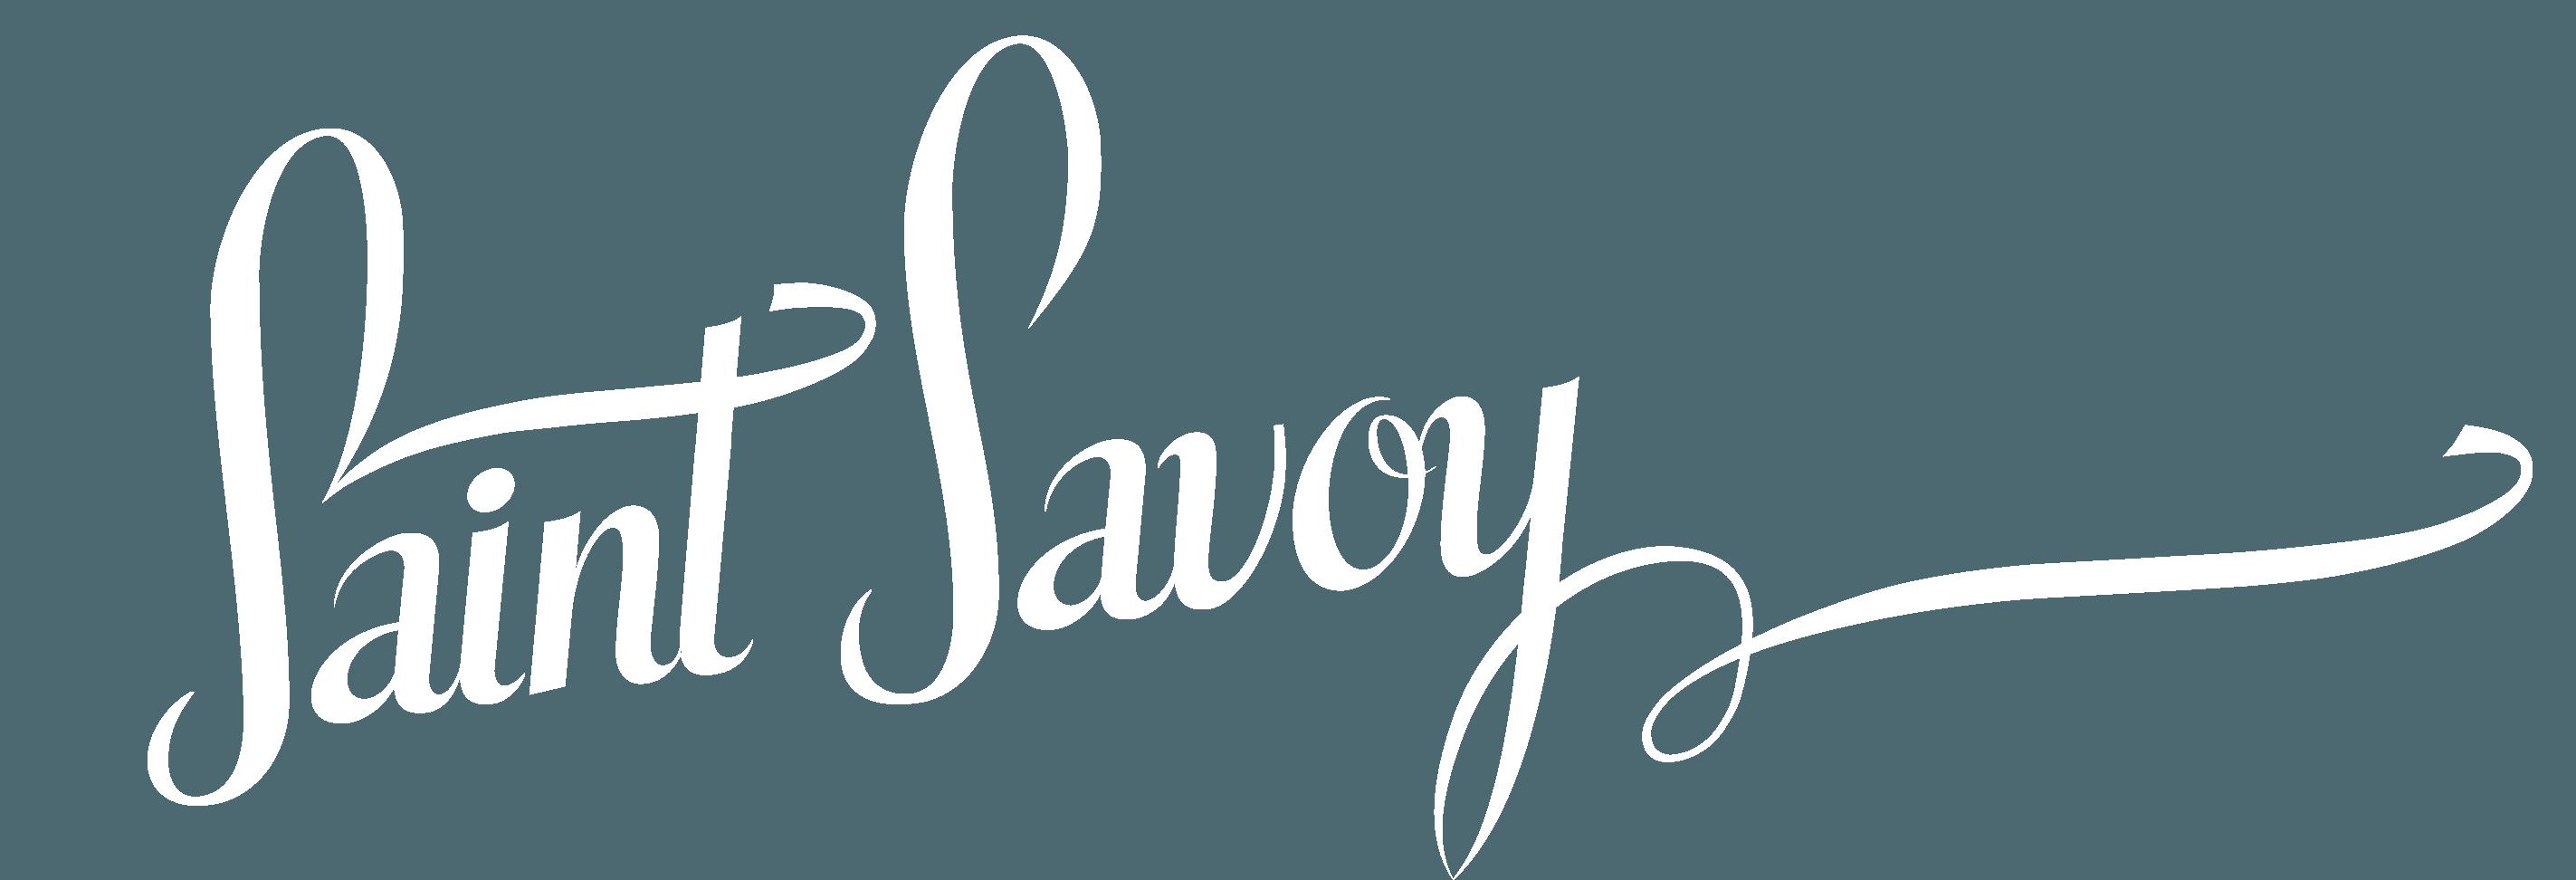 Saint Savoy